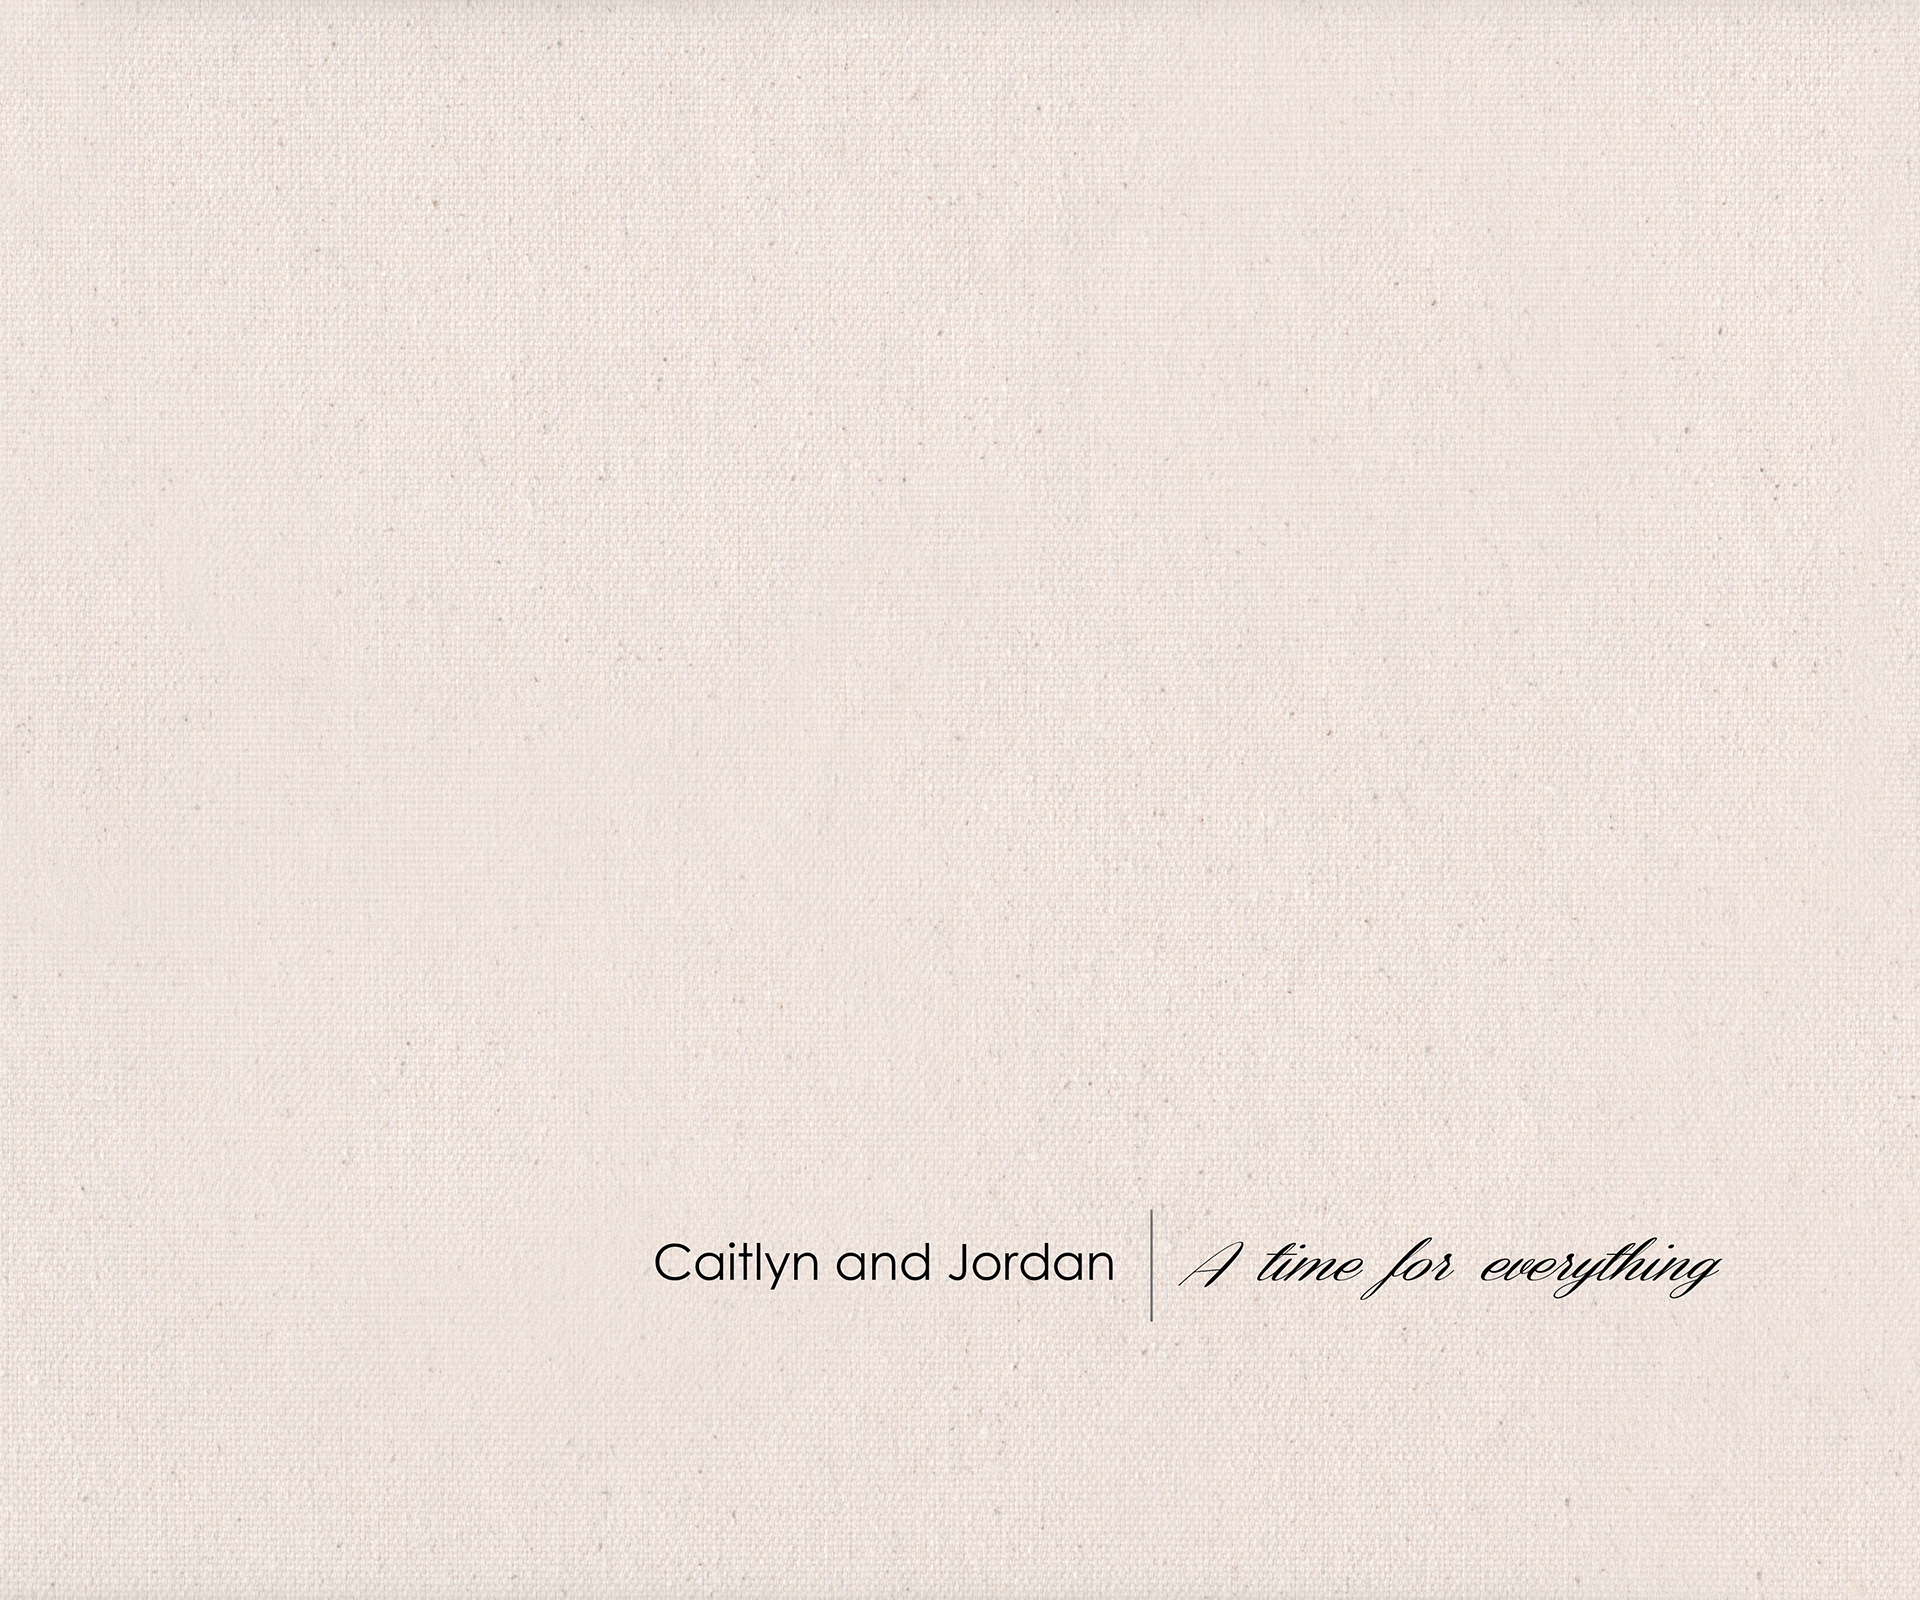 Destination engagement album :: front cover for Caitlyn + Jordan